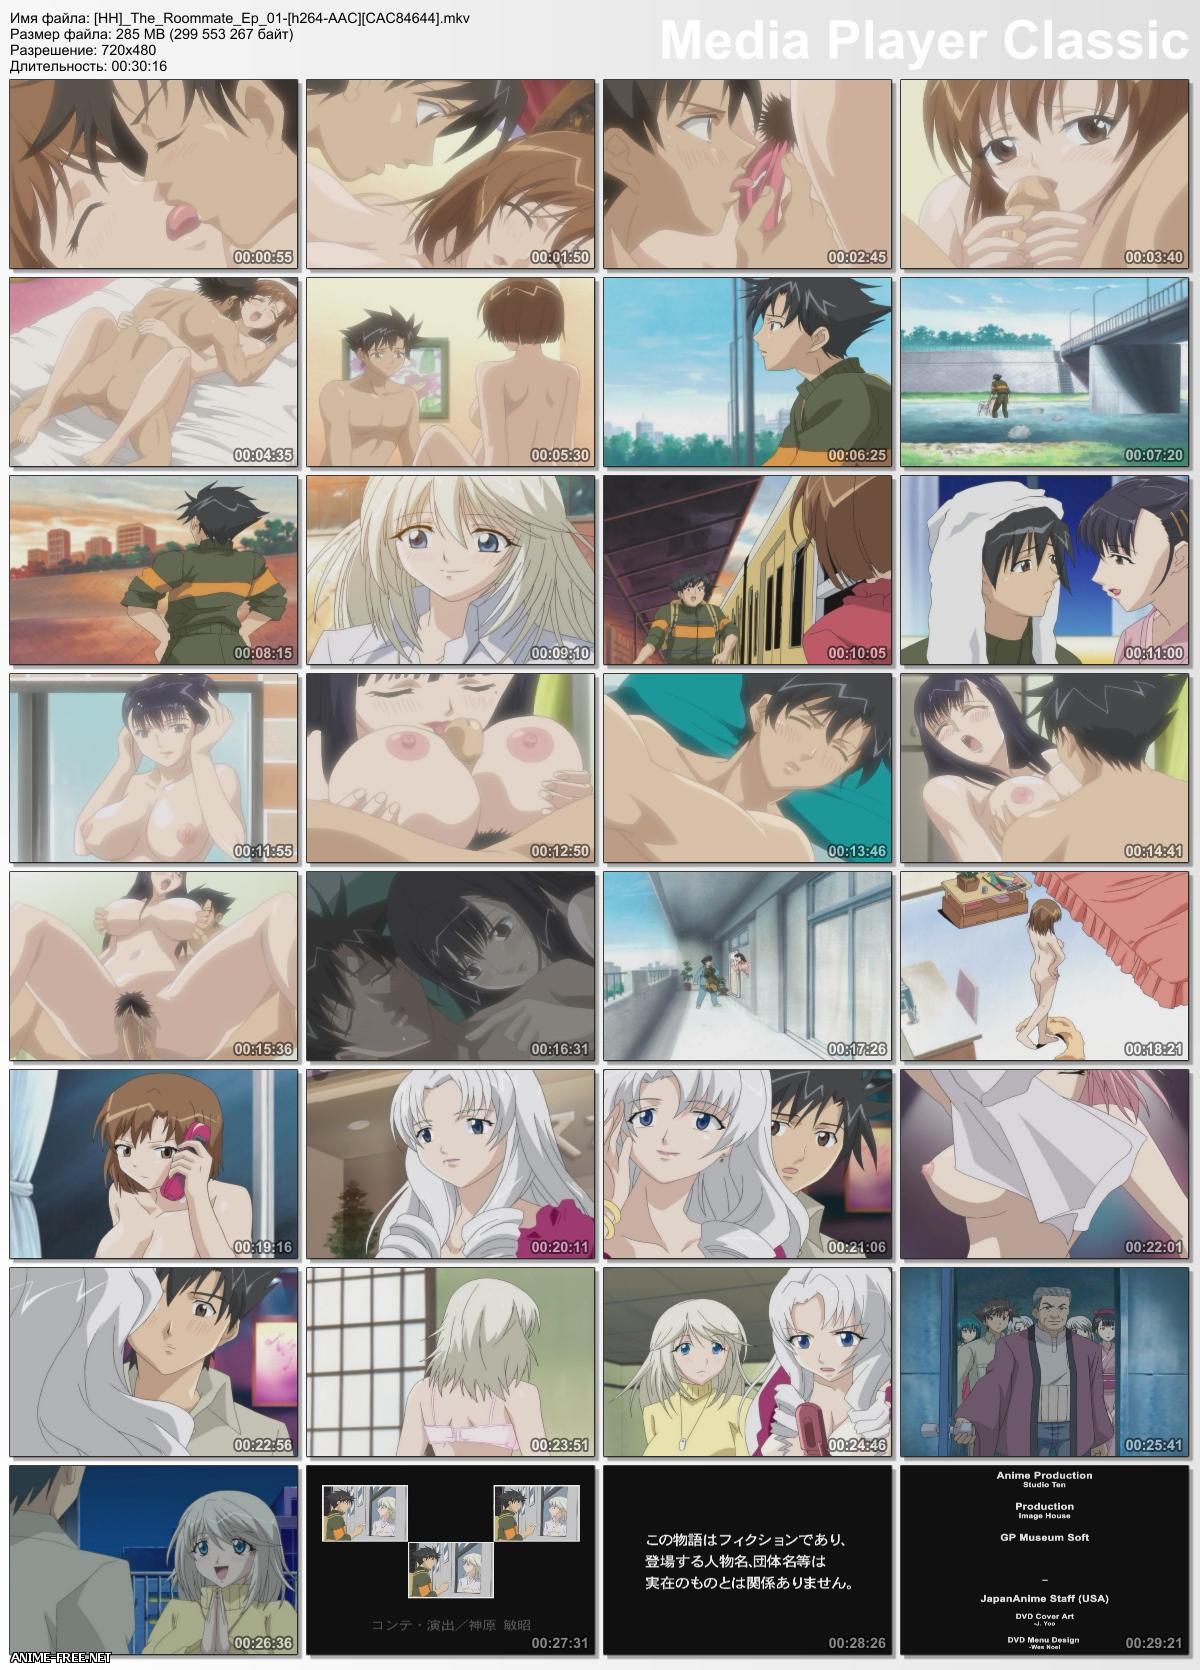 The Roommate / Kininaru Roommate / Heart de Roommate / Сосед по комнате [2 из 2] [ENG;JPN;RUS] Anime Hentai